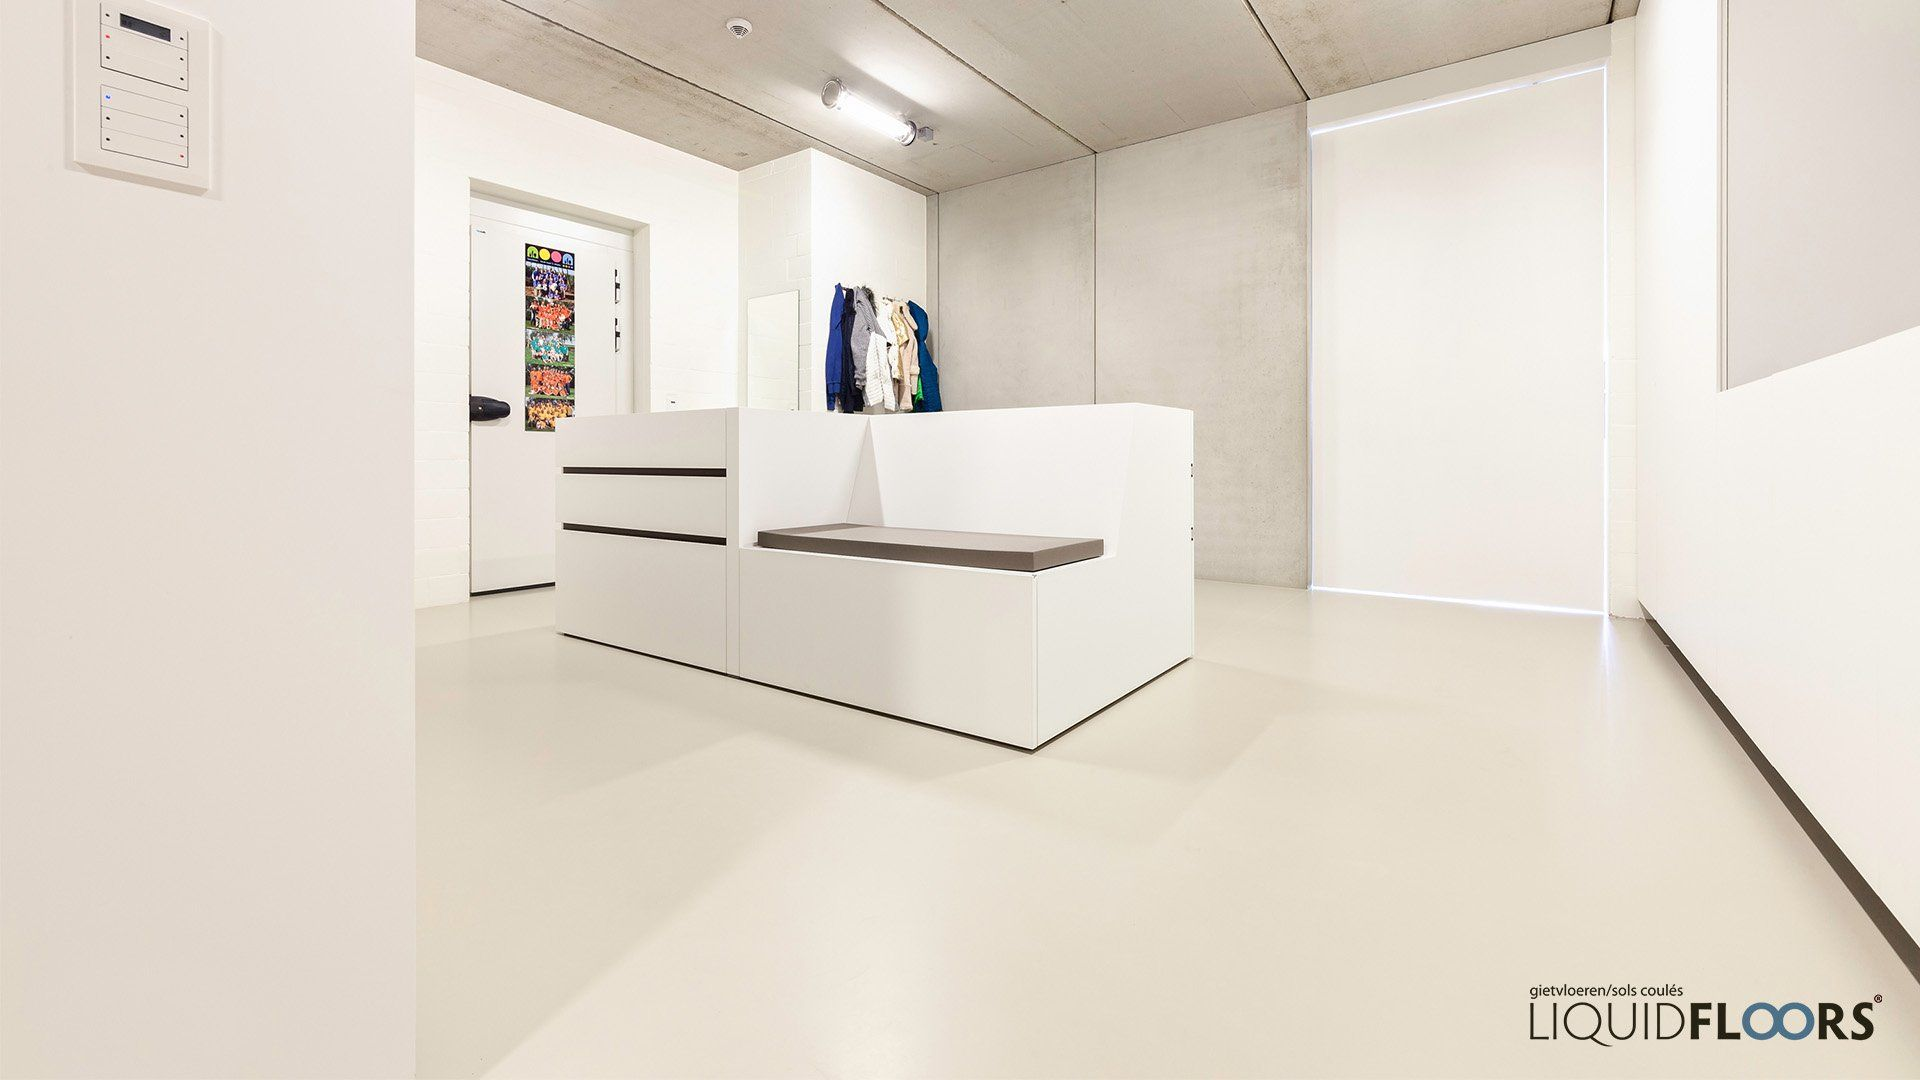 Beton In Interieur : Moderne architectuur inkomhal gietvloer kelder kleedkamer